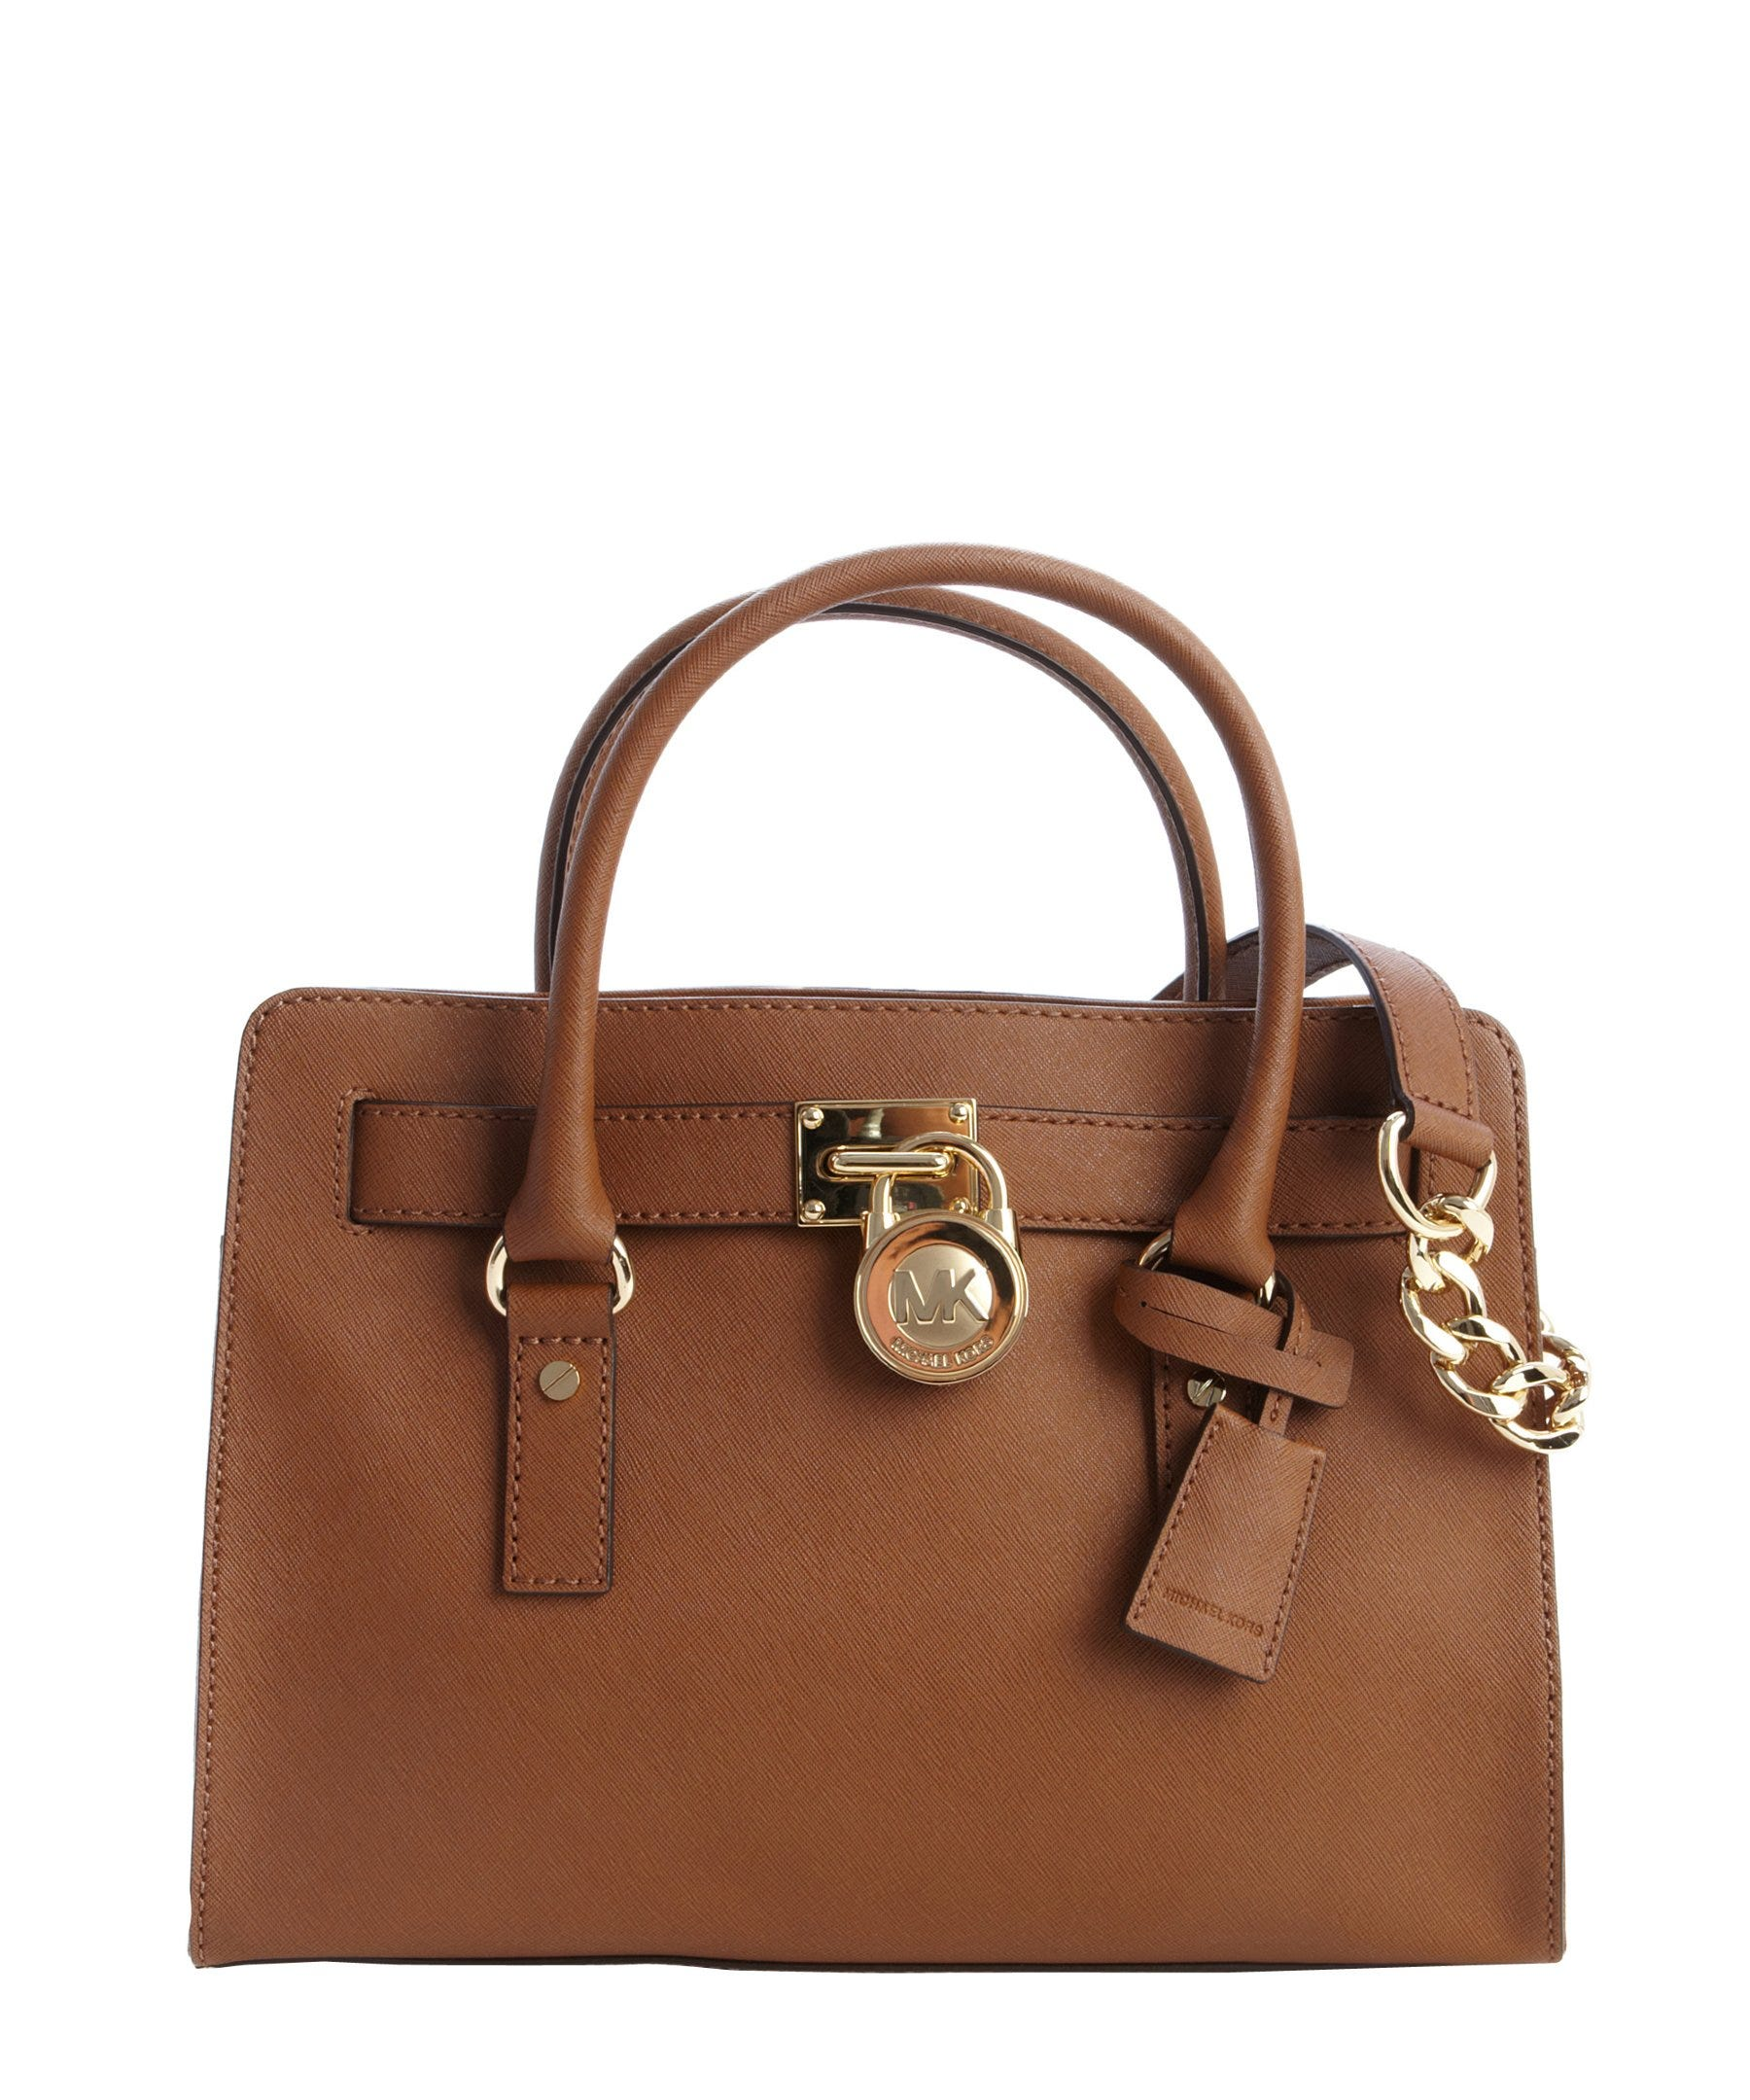 fb9dabc464d5 Win Free Designer Bags - Bluefly Contest